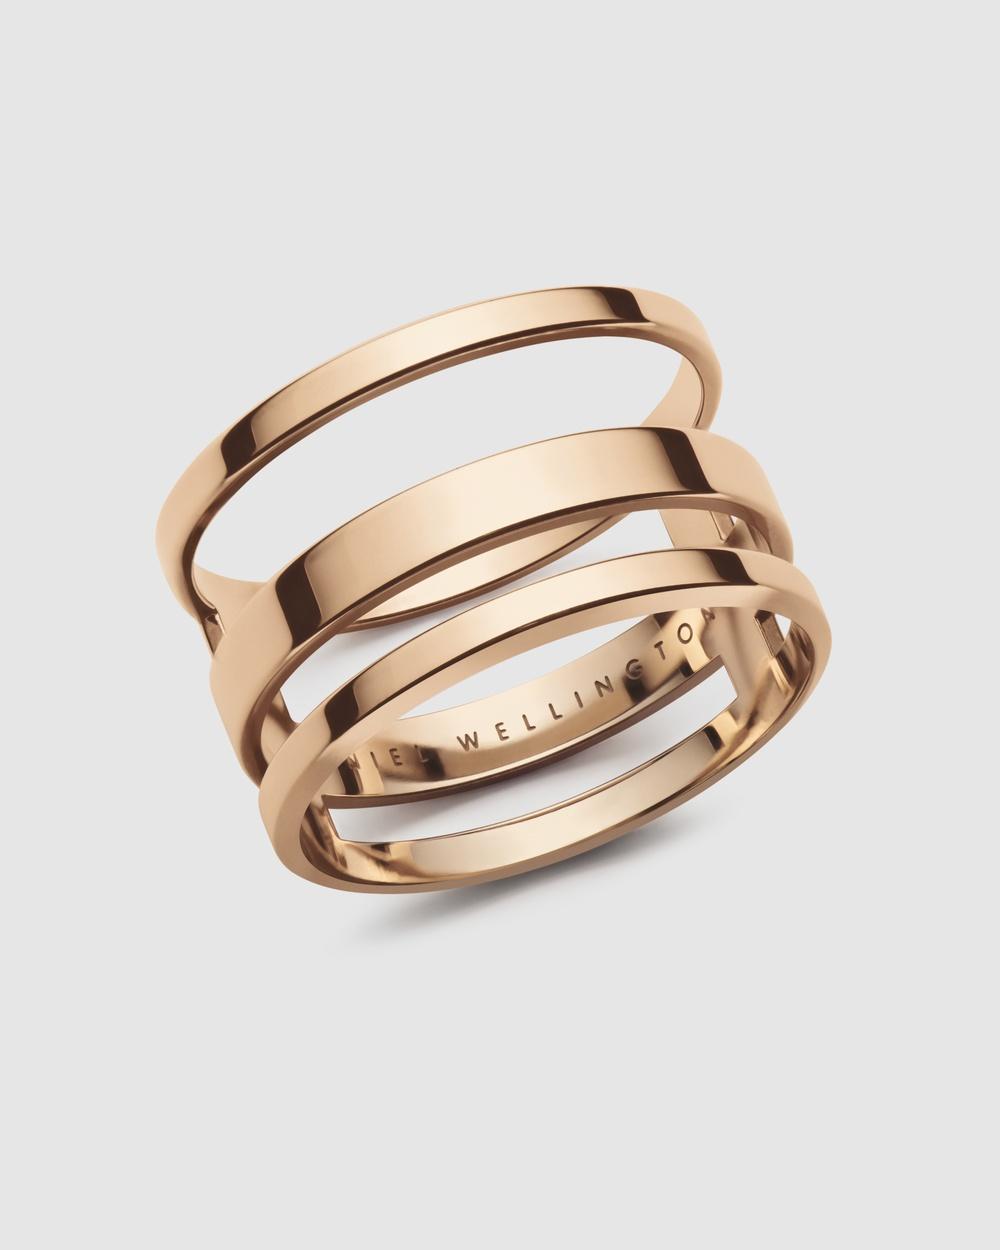 Daniel Wellington Elan Triad Ring Jewellery Rose gold